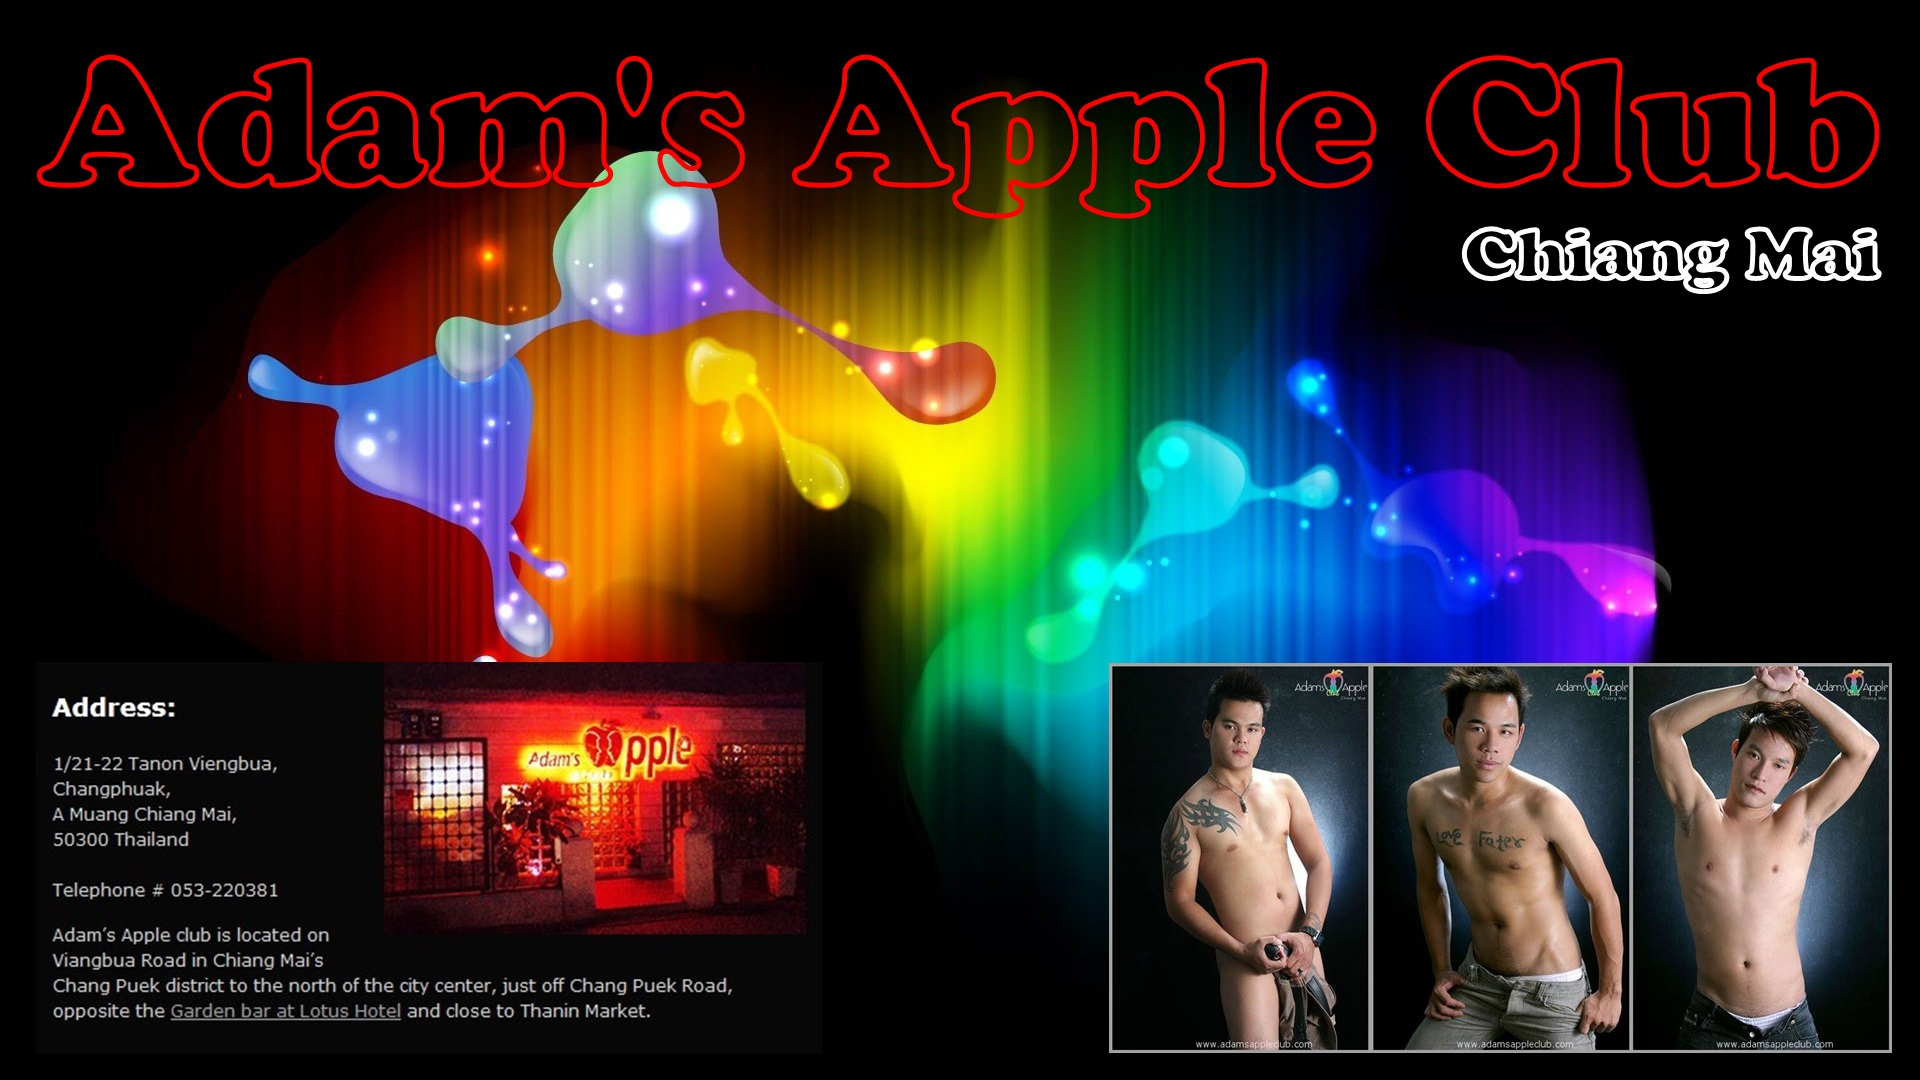 Adams Apple Club Gay Life Chaing Mai Map b.jpg